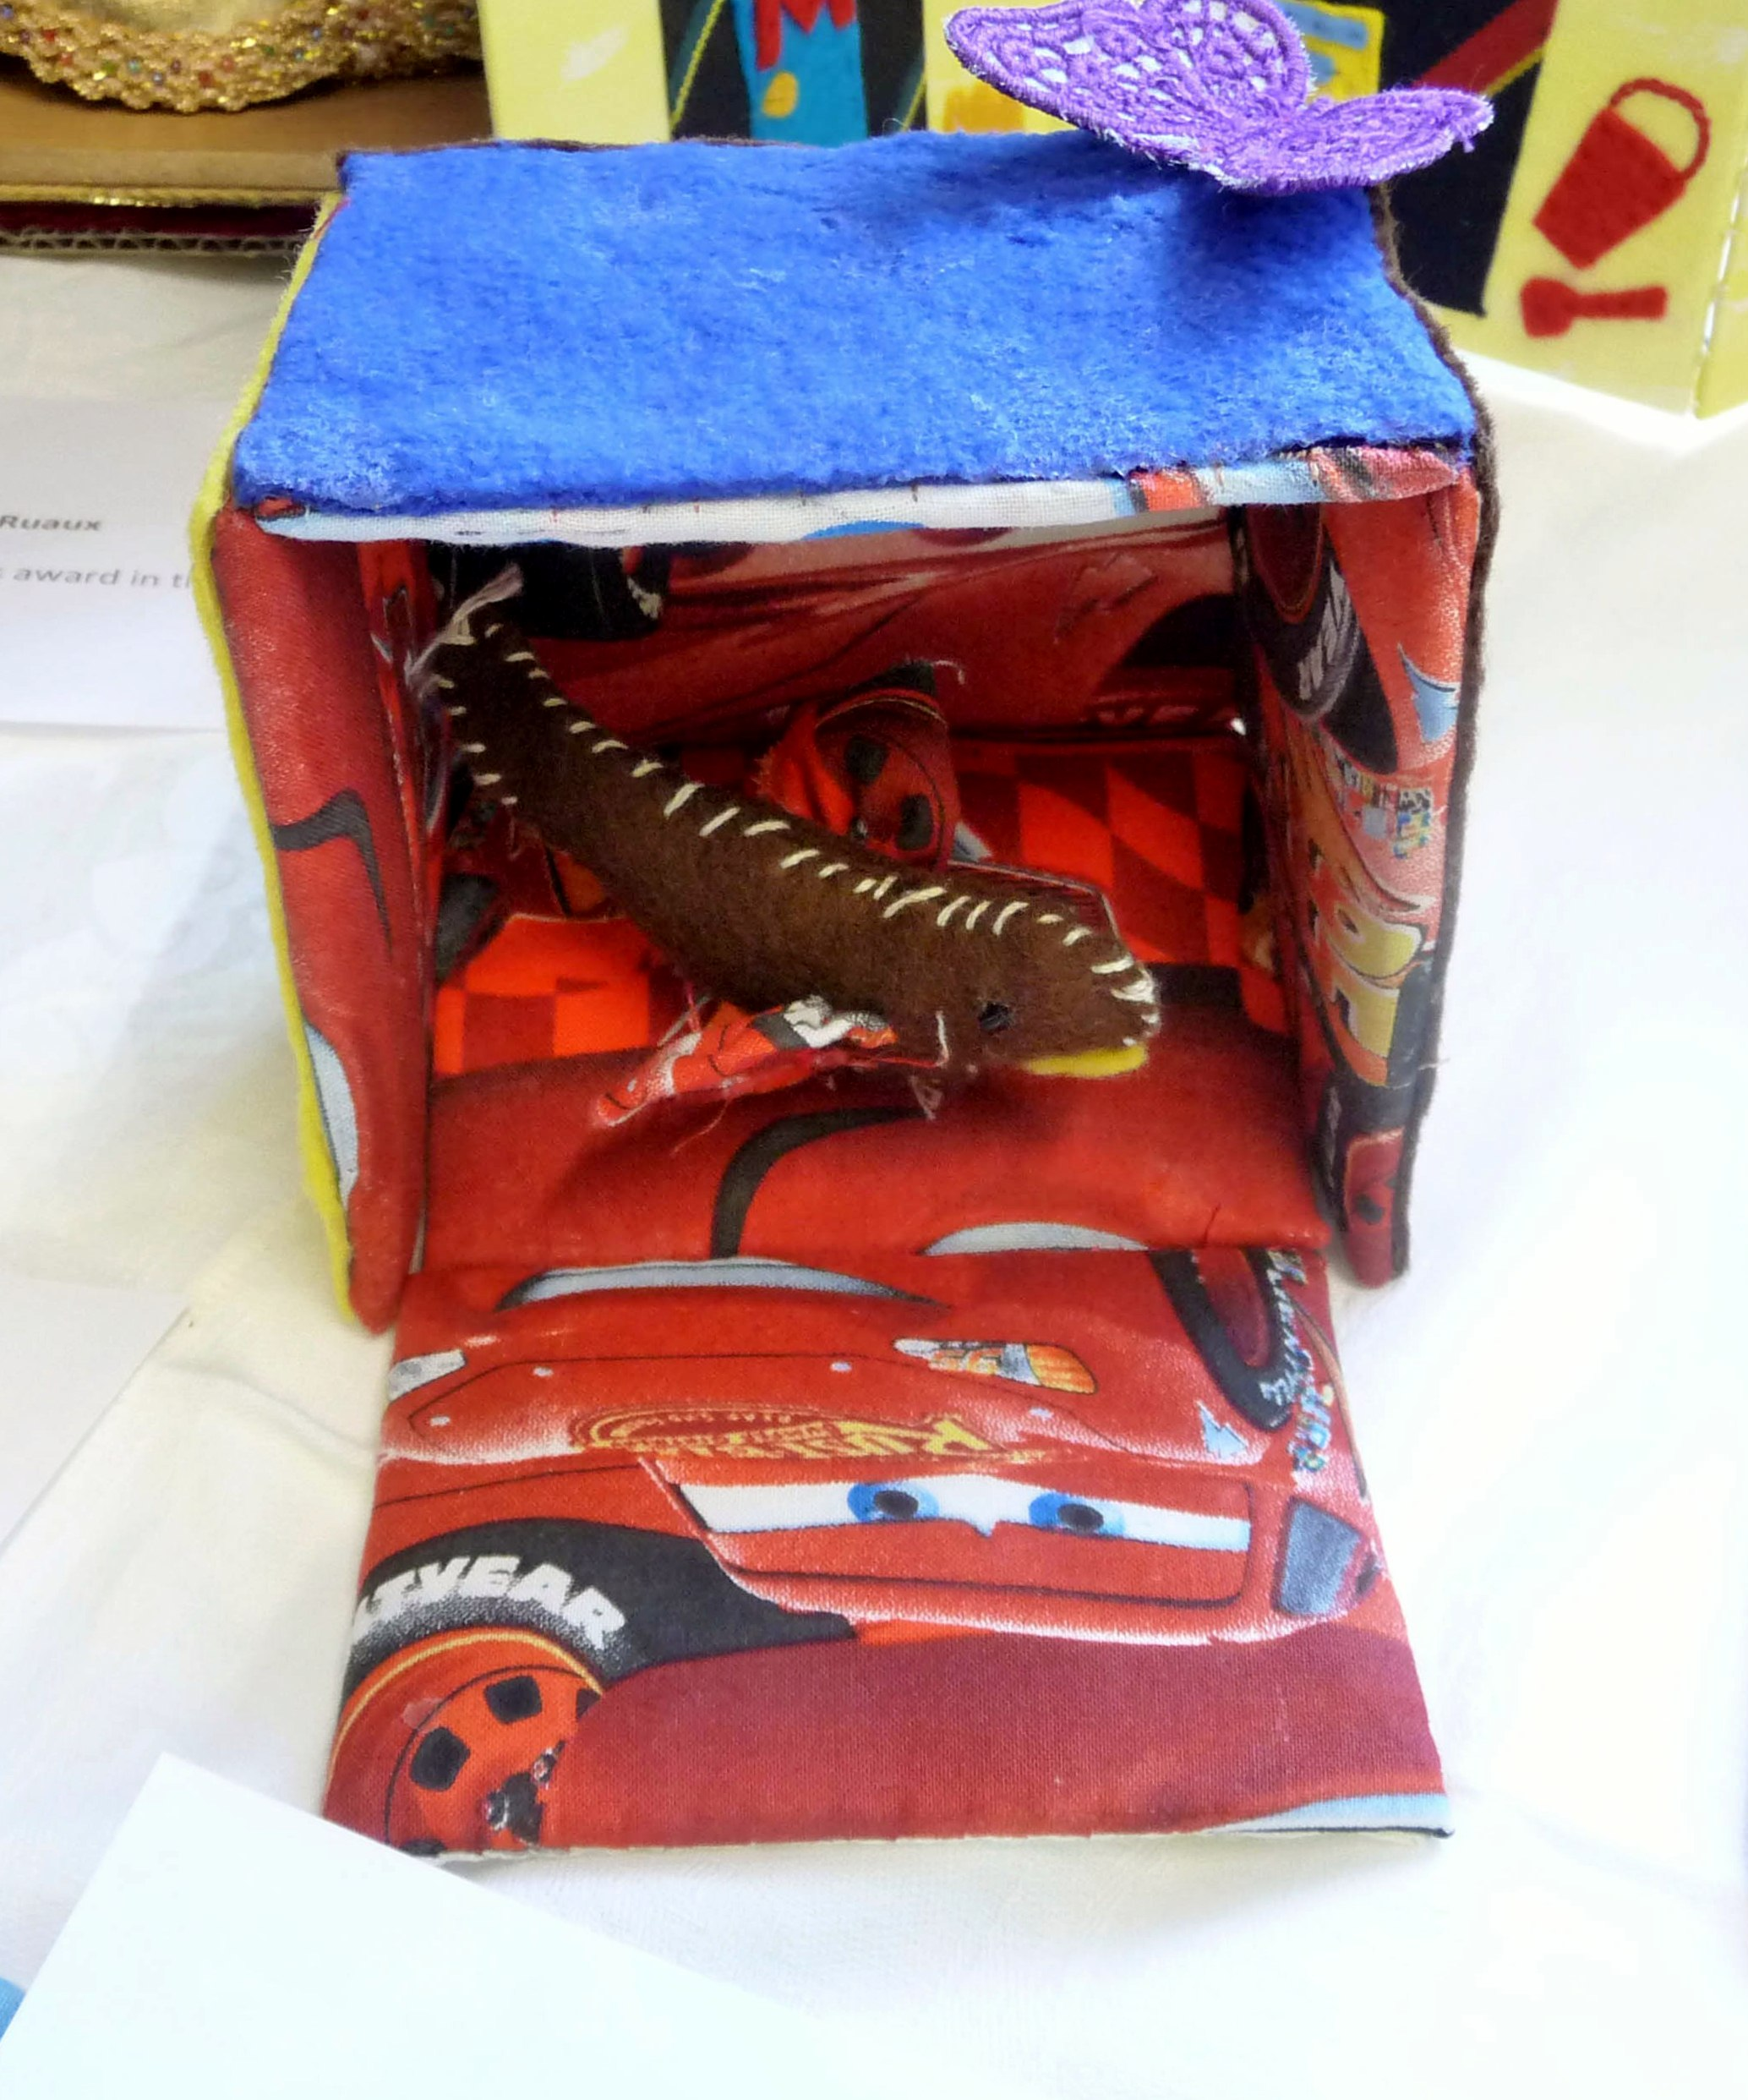 BUTTERFLY IN A BOX by Reuben Melhuish-Jones, age 5, Altrincham YE